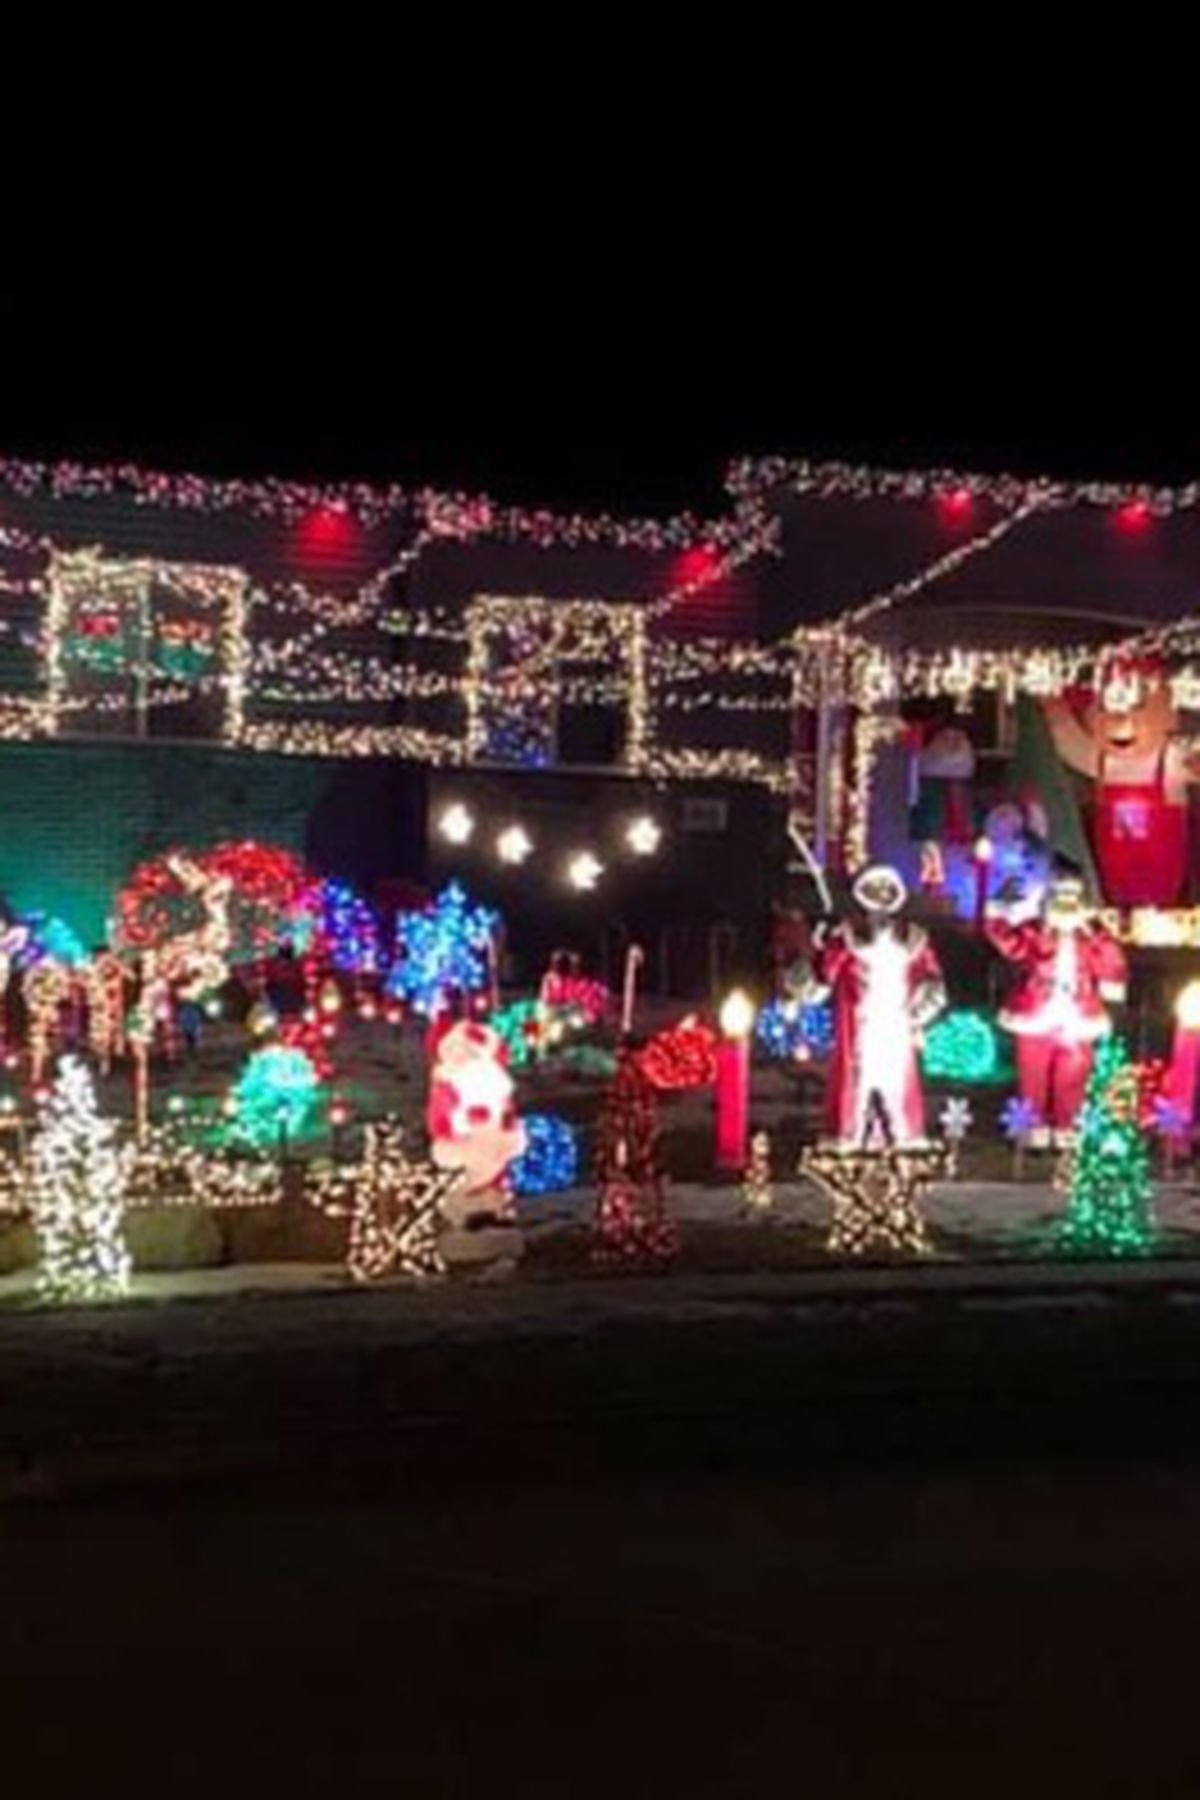 Christmas Light Displays Lincoln Nebraska Map 2020 Map of Christmas light displays in Lincoln